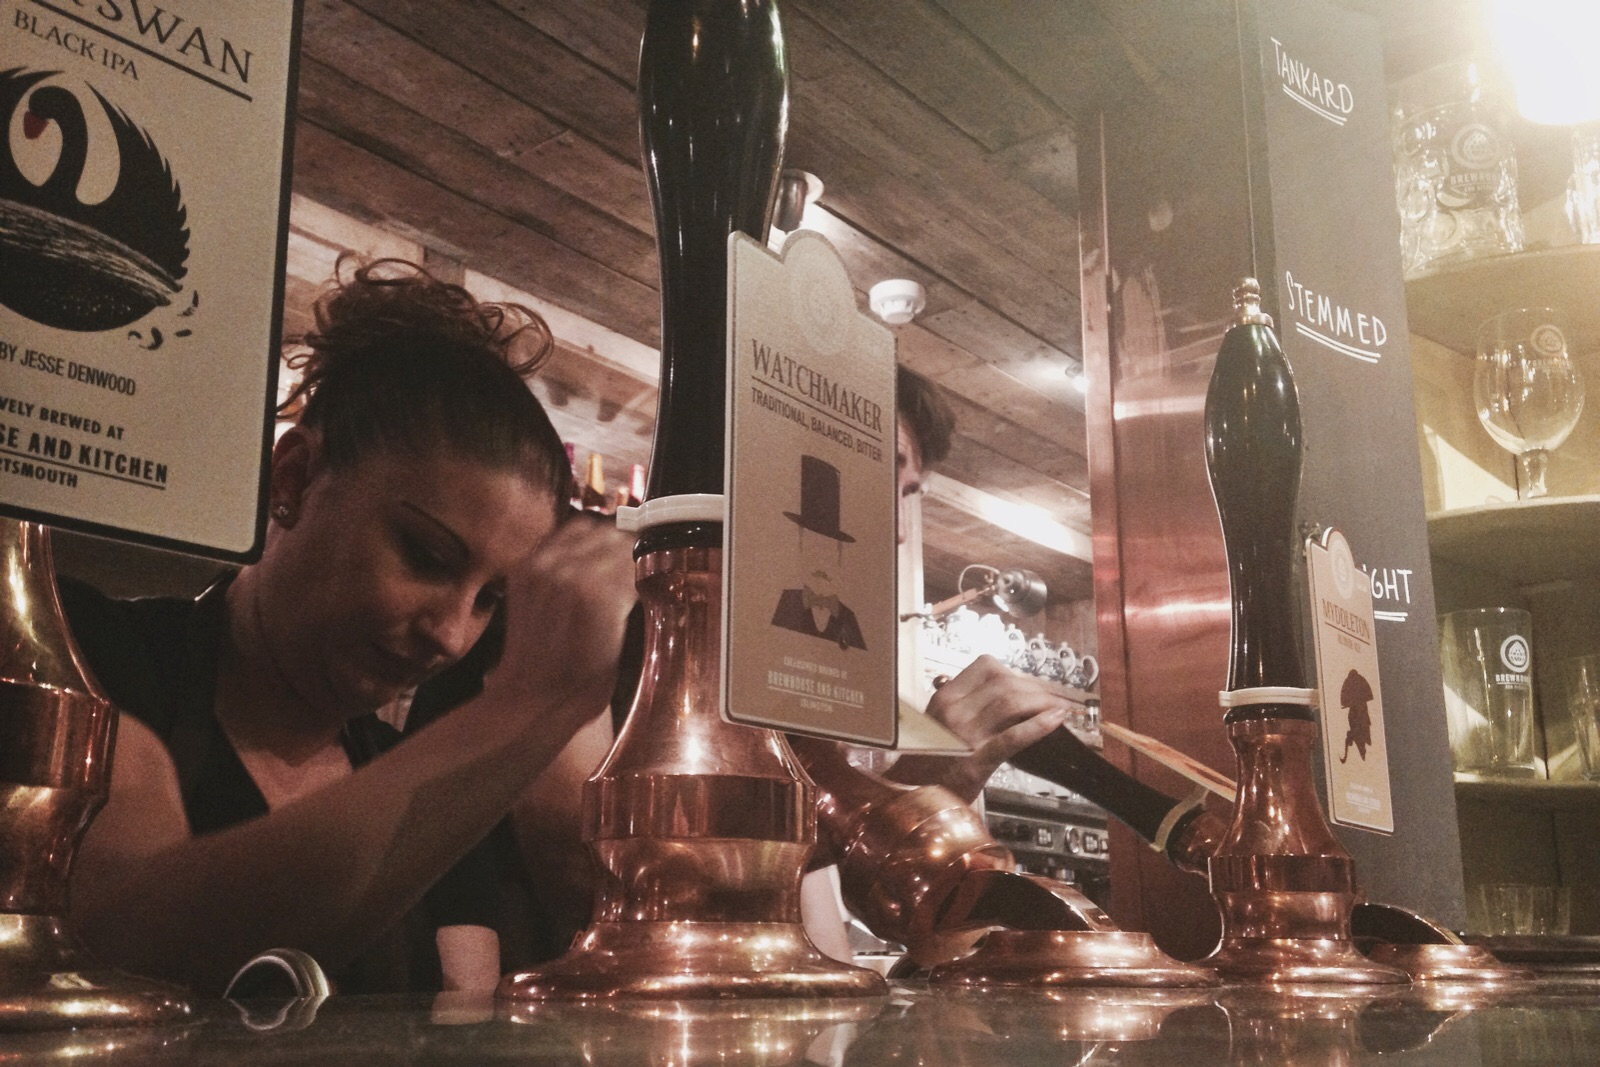 Brewhouse%2BKitchen%2BIslington%2B3.jpg